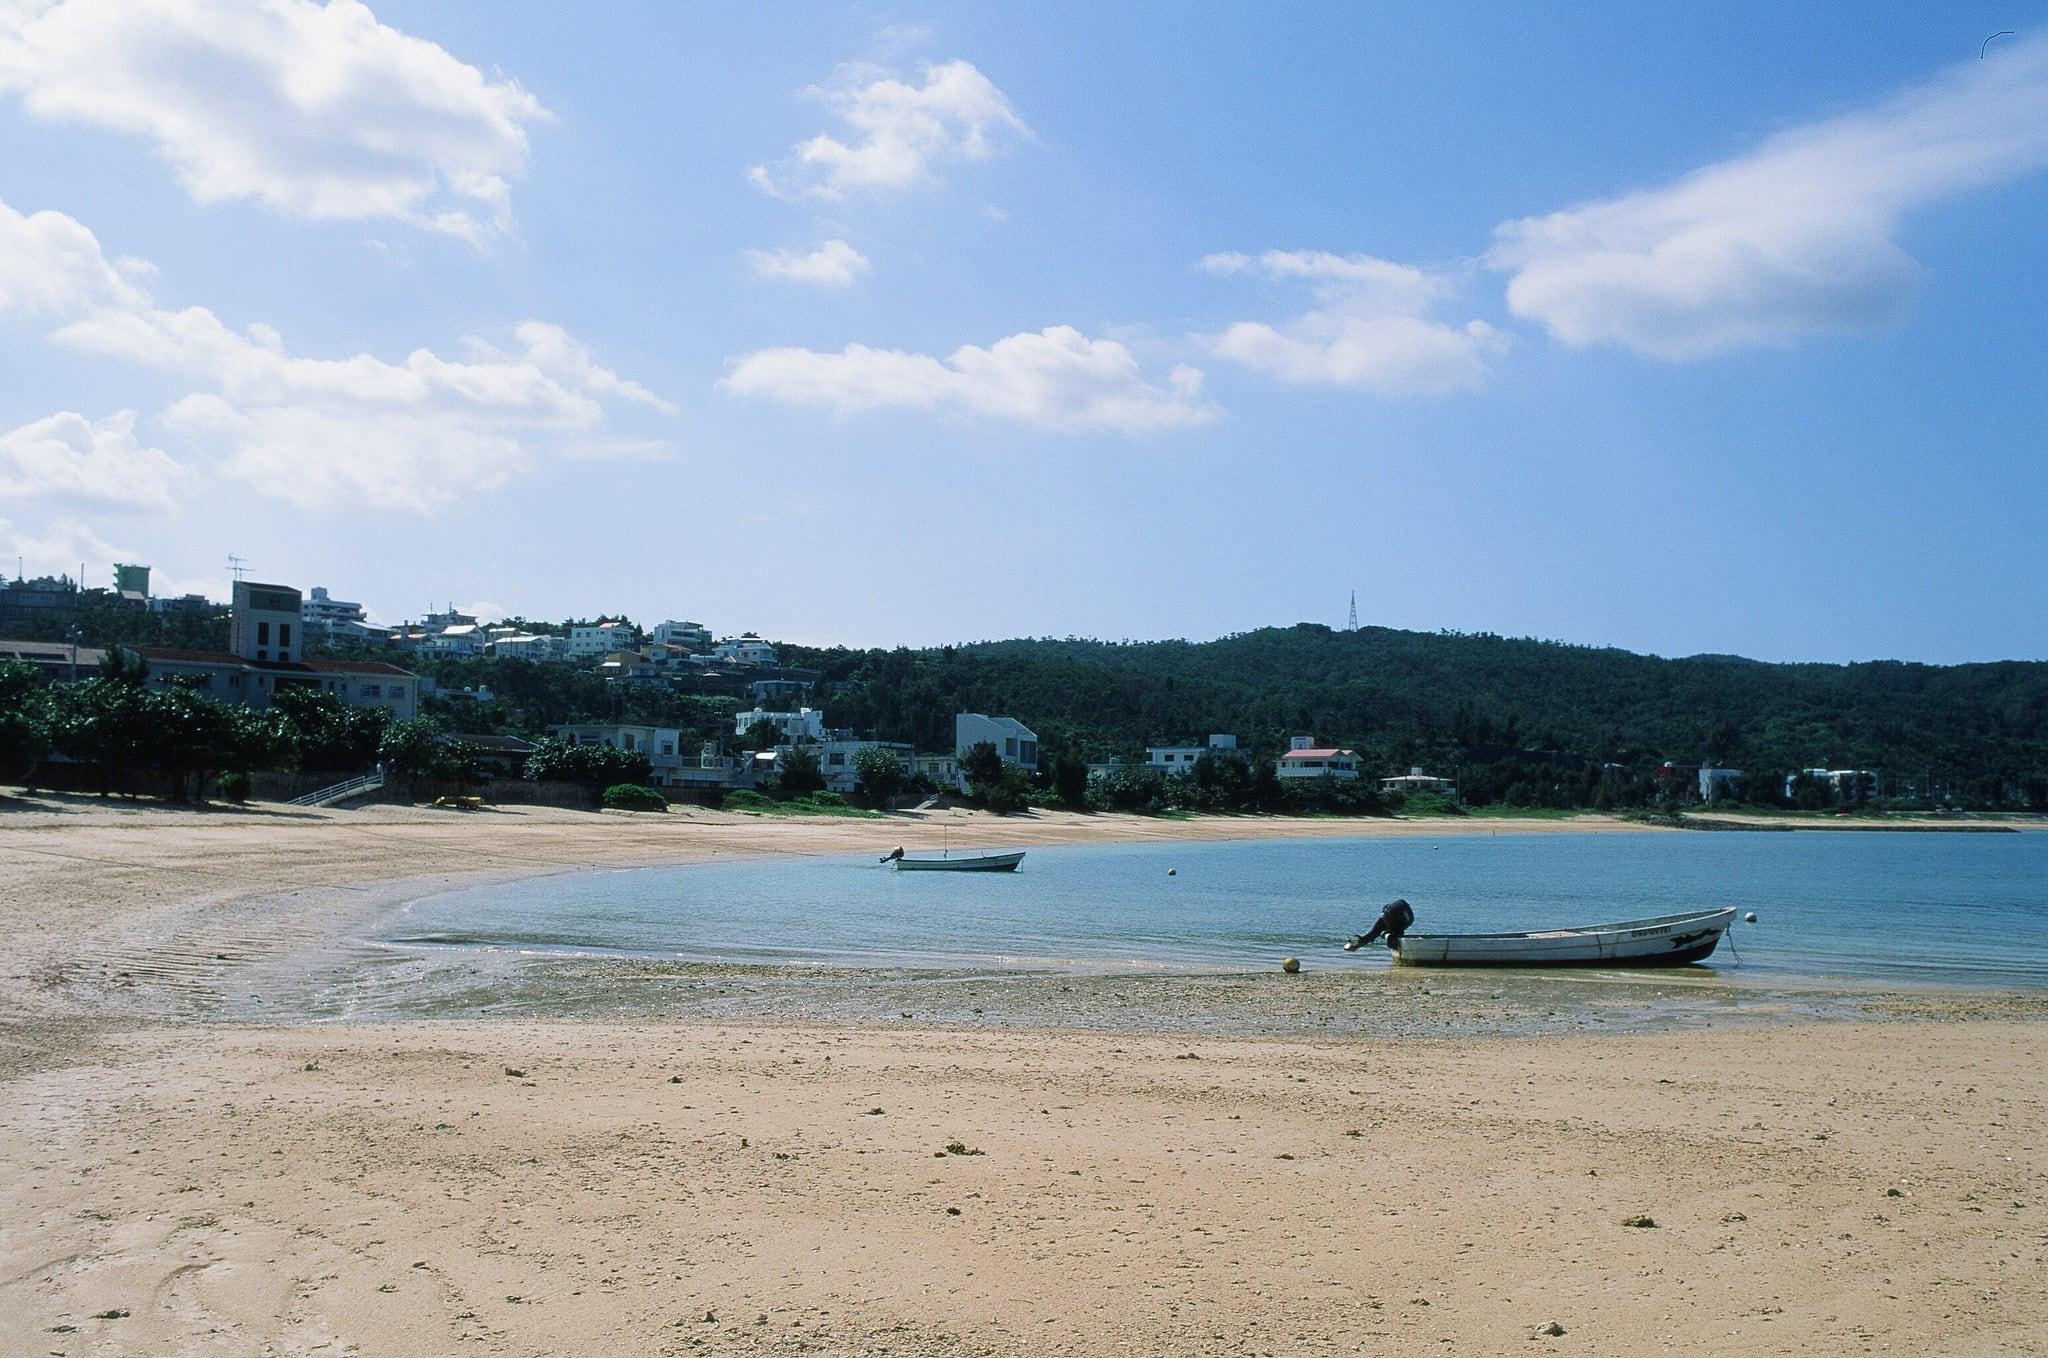 Hình ảnh của Renaissance Beach (ルネッサンスビーチ) Renaissance Beach. japan 35mm nikon fuji velvia okinawa nikkor fm2 iso50 rvp50